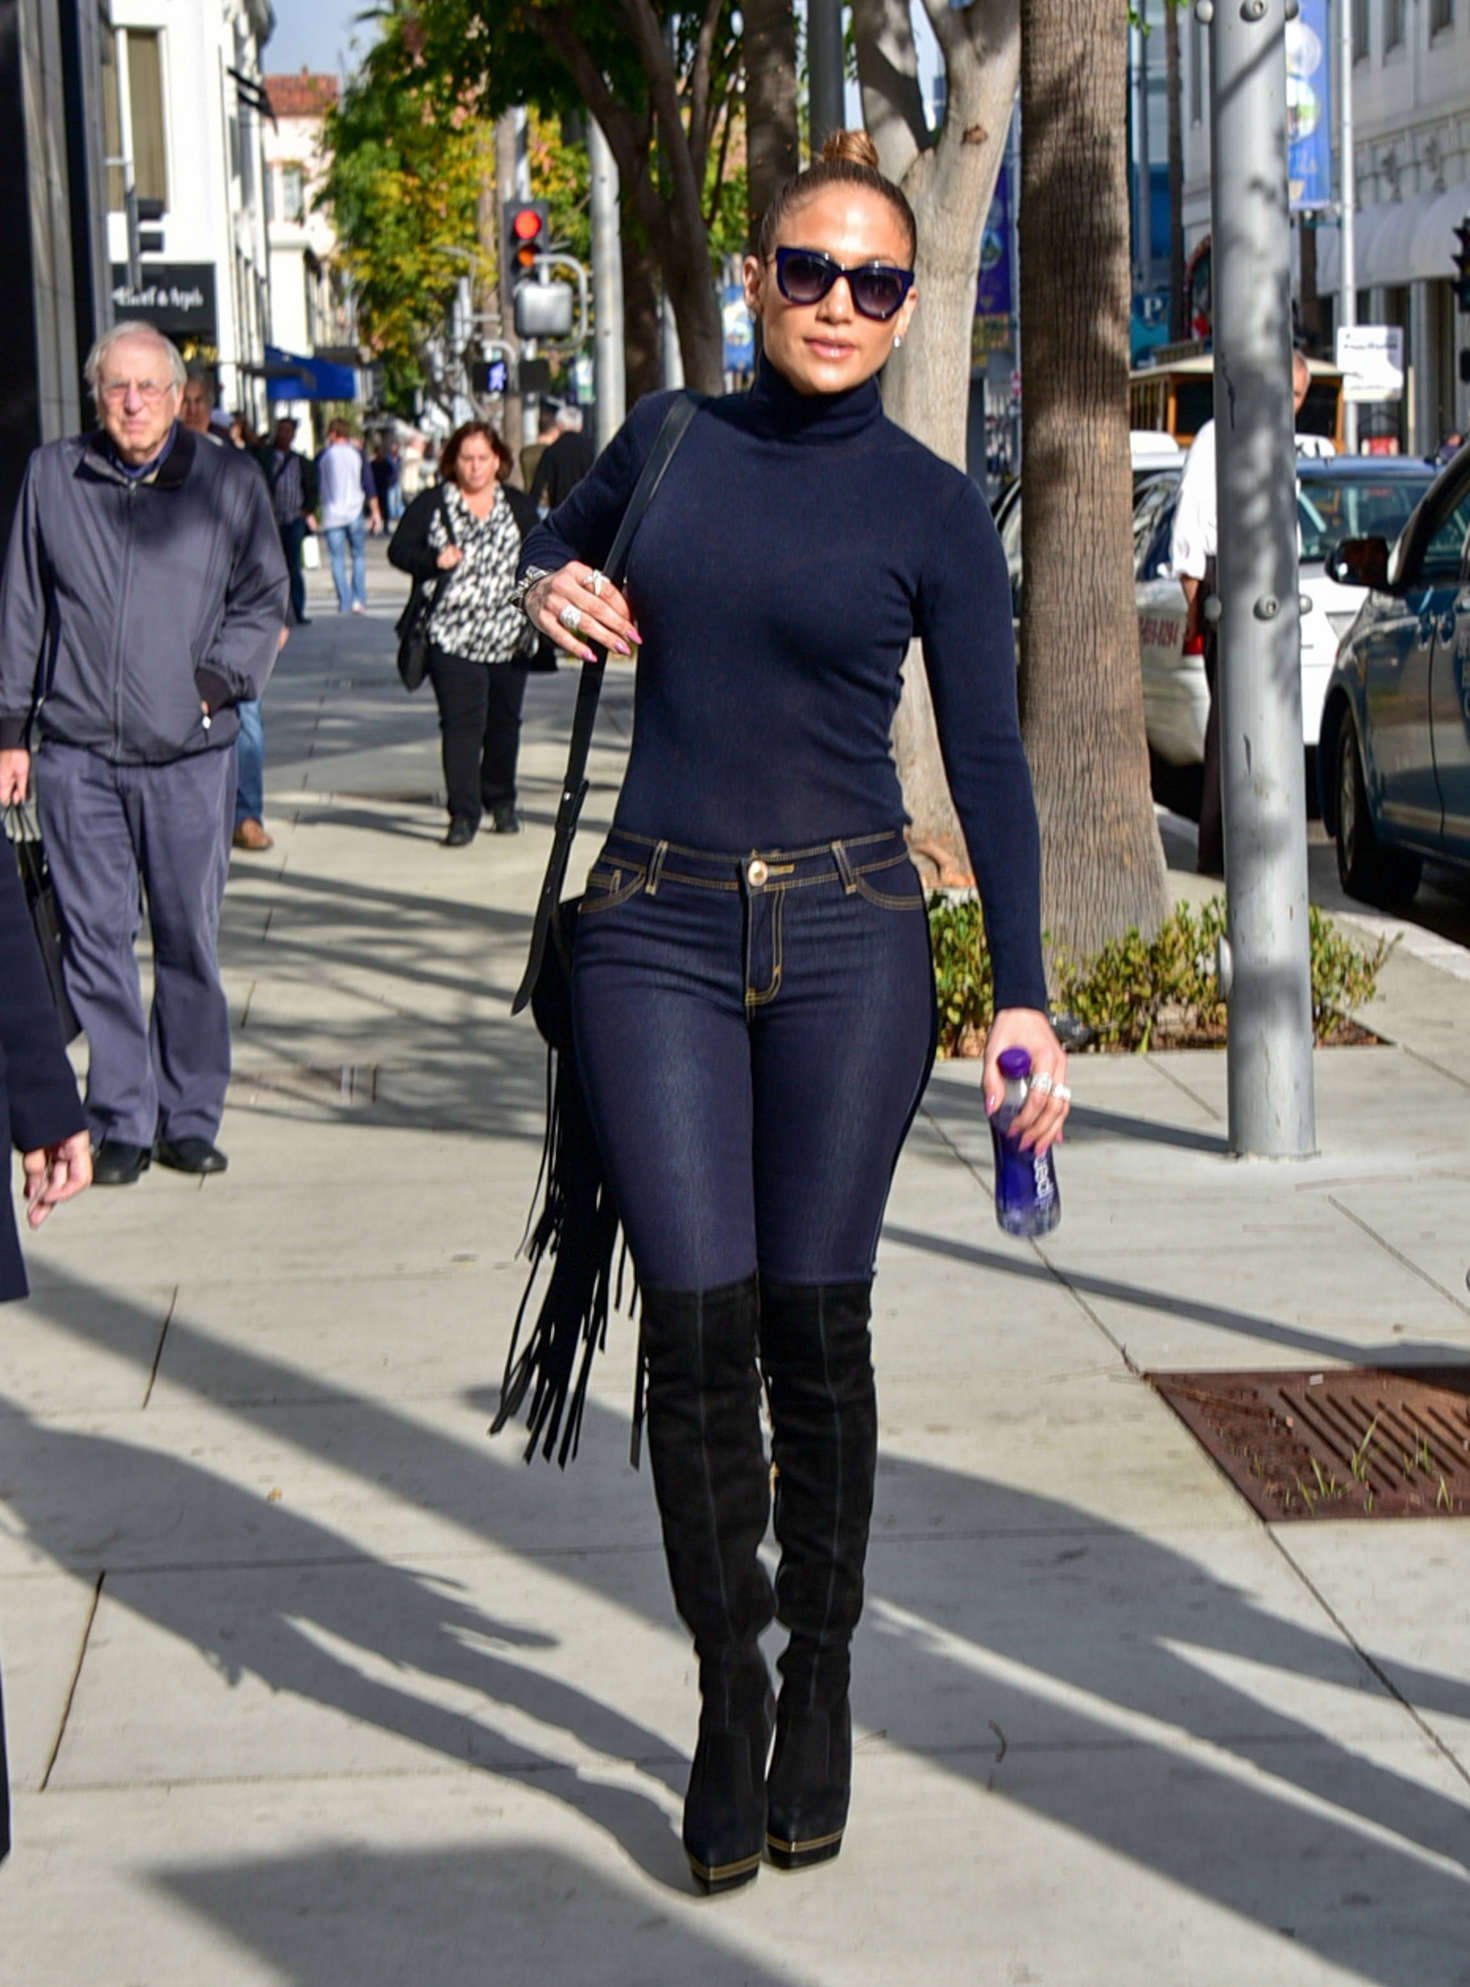 Jennifer Lopez Booty In Skinny Jeans 06 Gotceleb